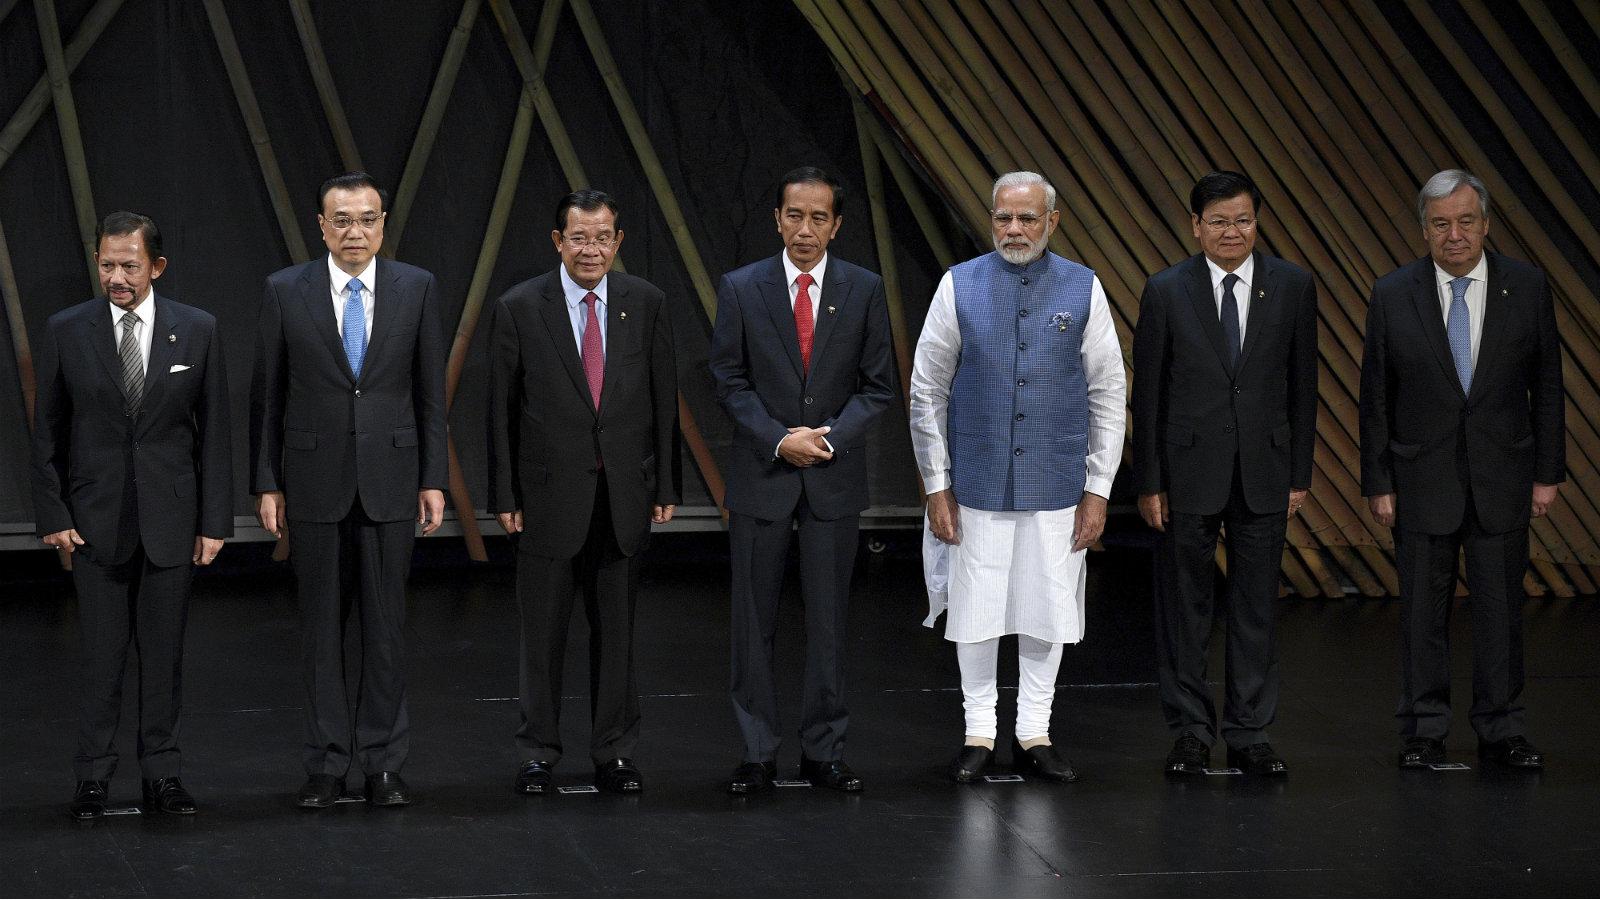 From left: Brunei Sulatan Hassanal Bolkiah, Chinese premier Li Keqiang, Cambodian prime minister Hun Sen, Indonesian president Joko Widodo, Indian prime minister Narendra Modi, Laos prime minister Thongloun Sisoulith, and United Nations secretary-general Antonio Guterres at the 31st ASEAN Summit in Manila in November 2017.